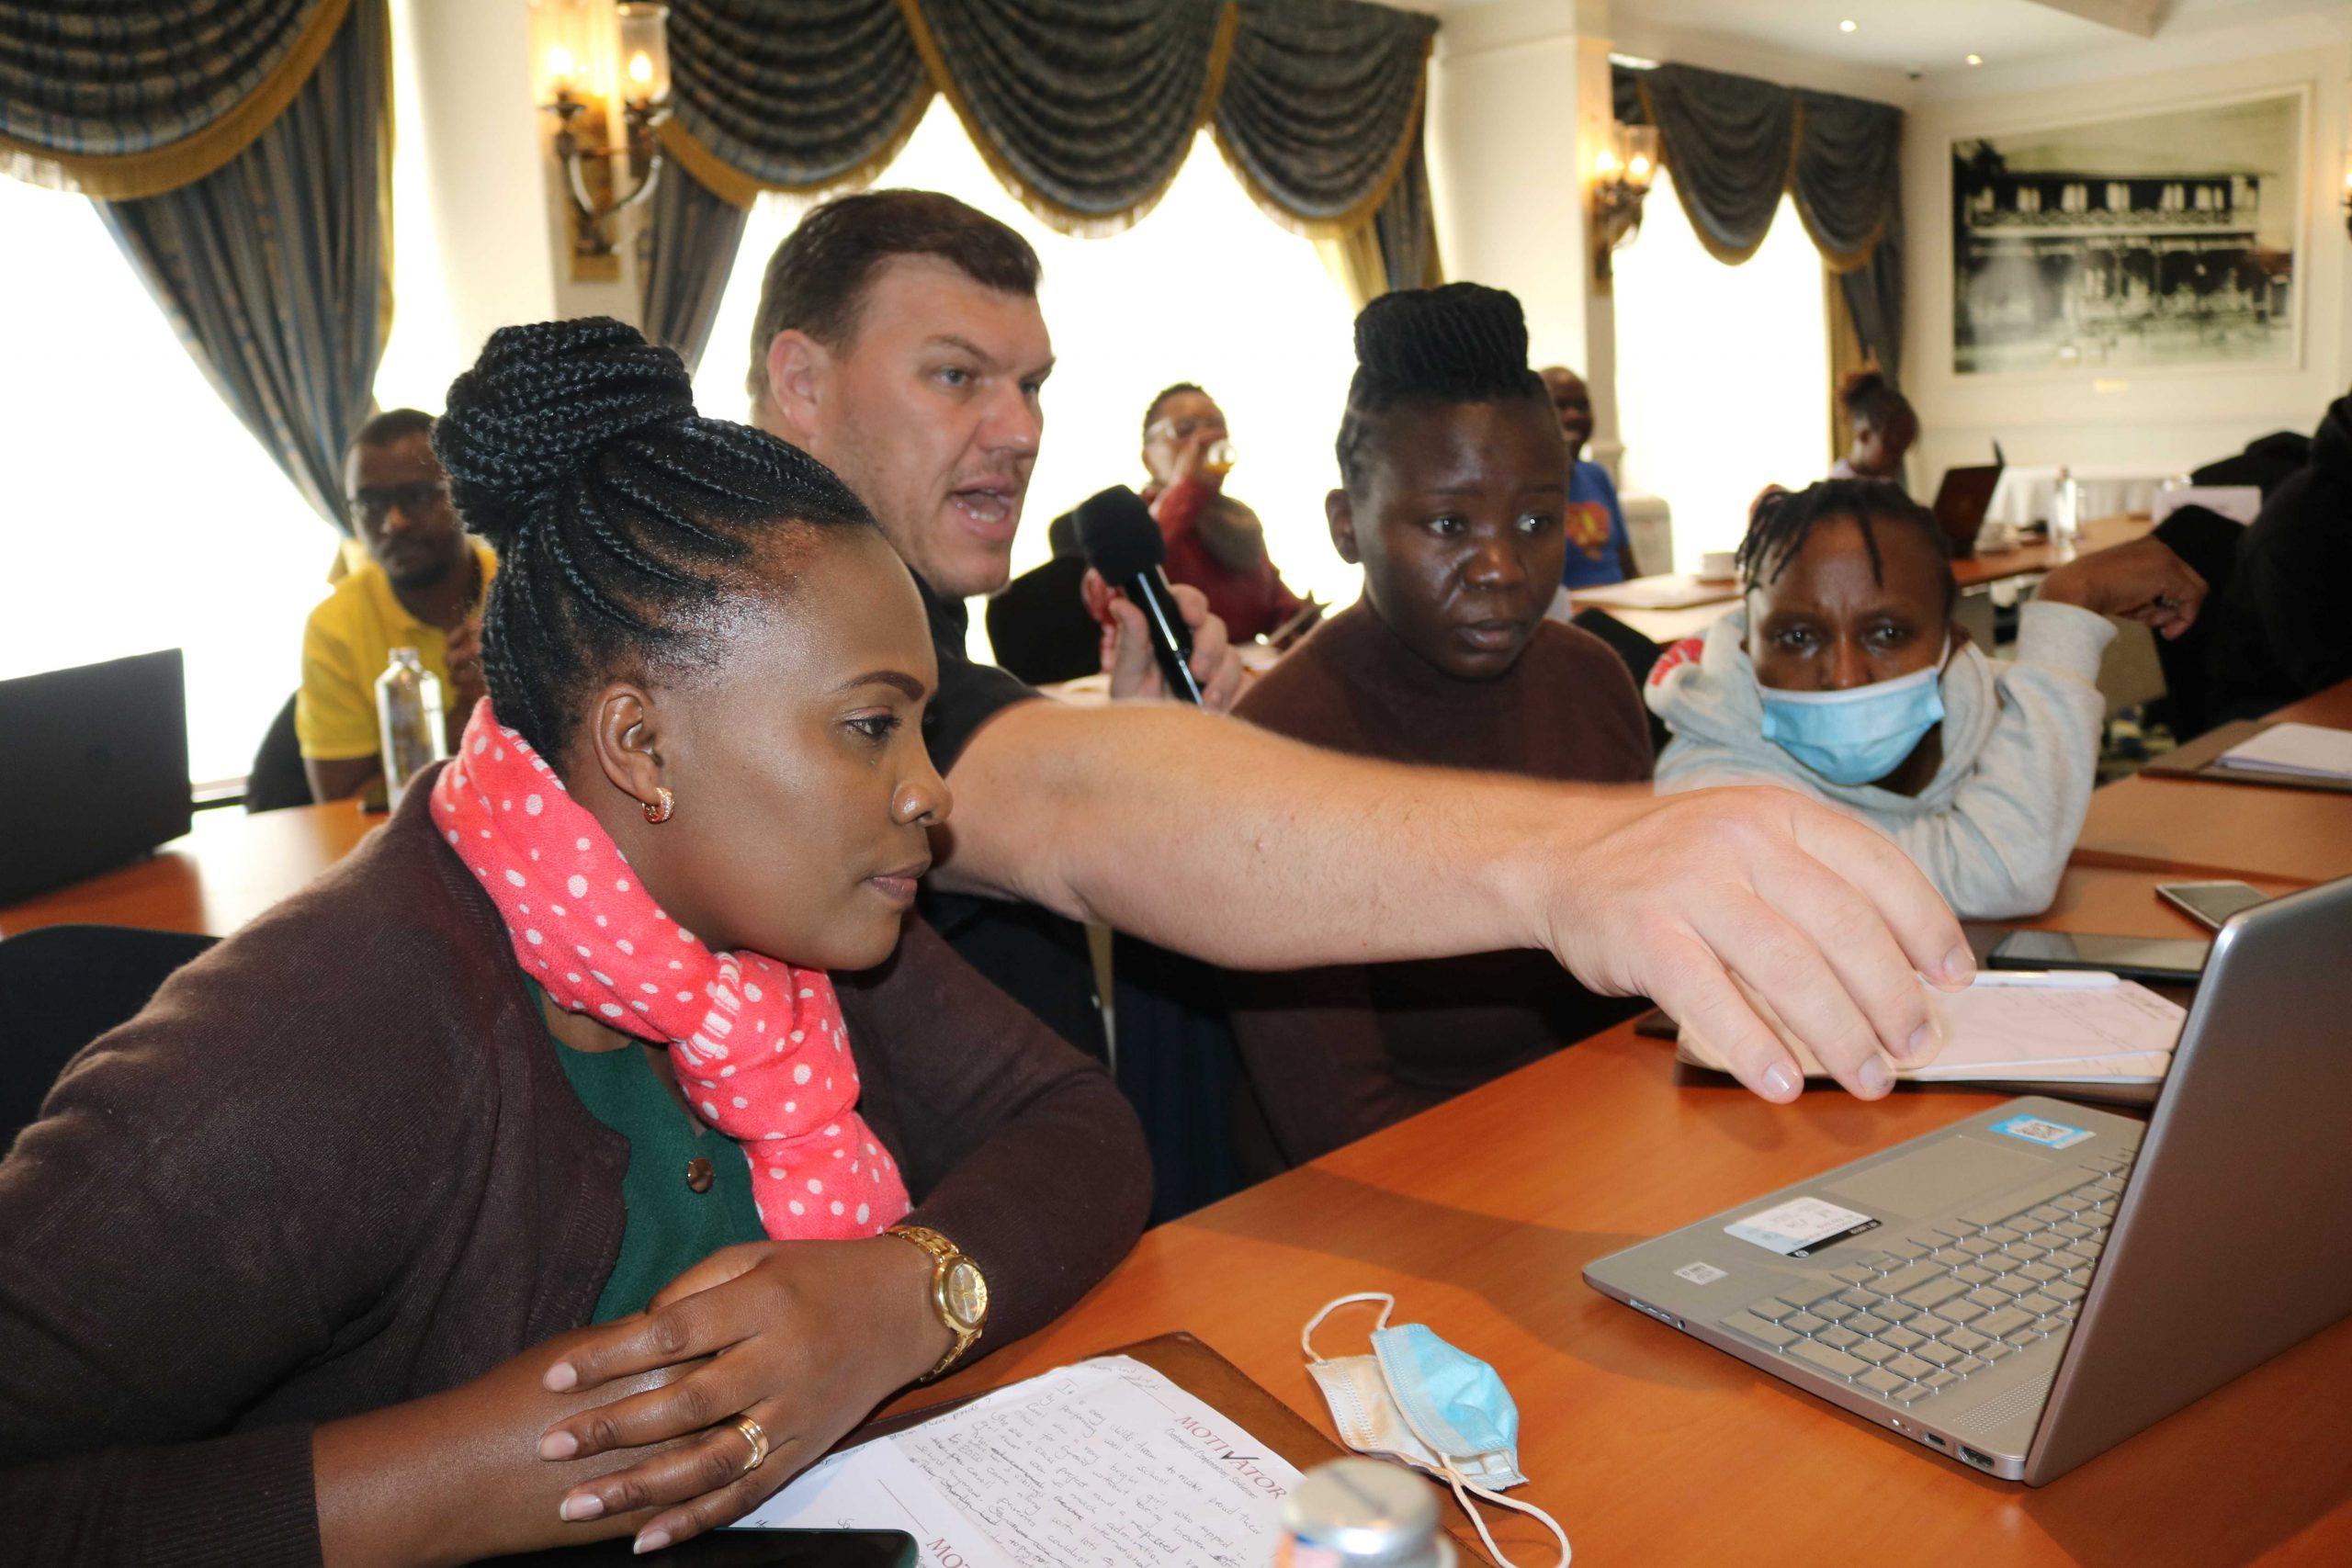 Nairobi: Digital content creative bootcamp